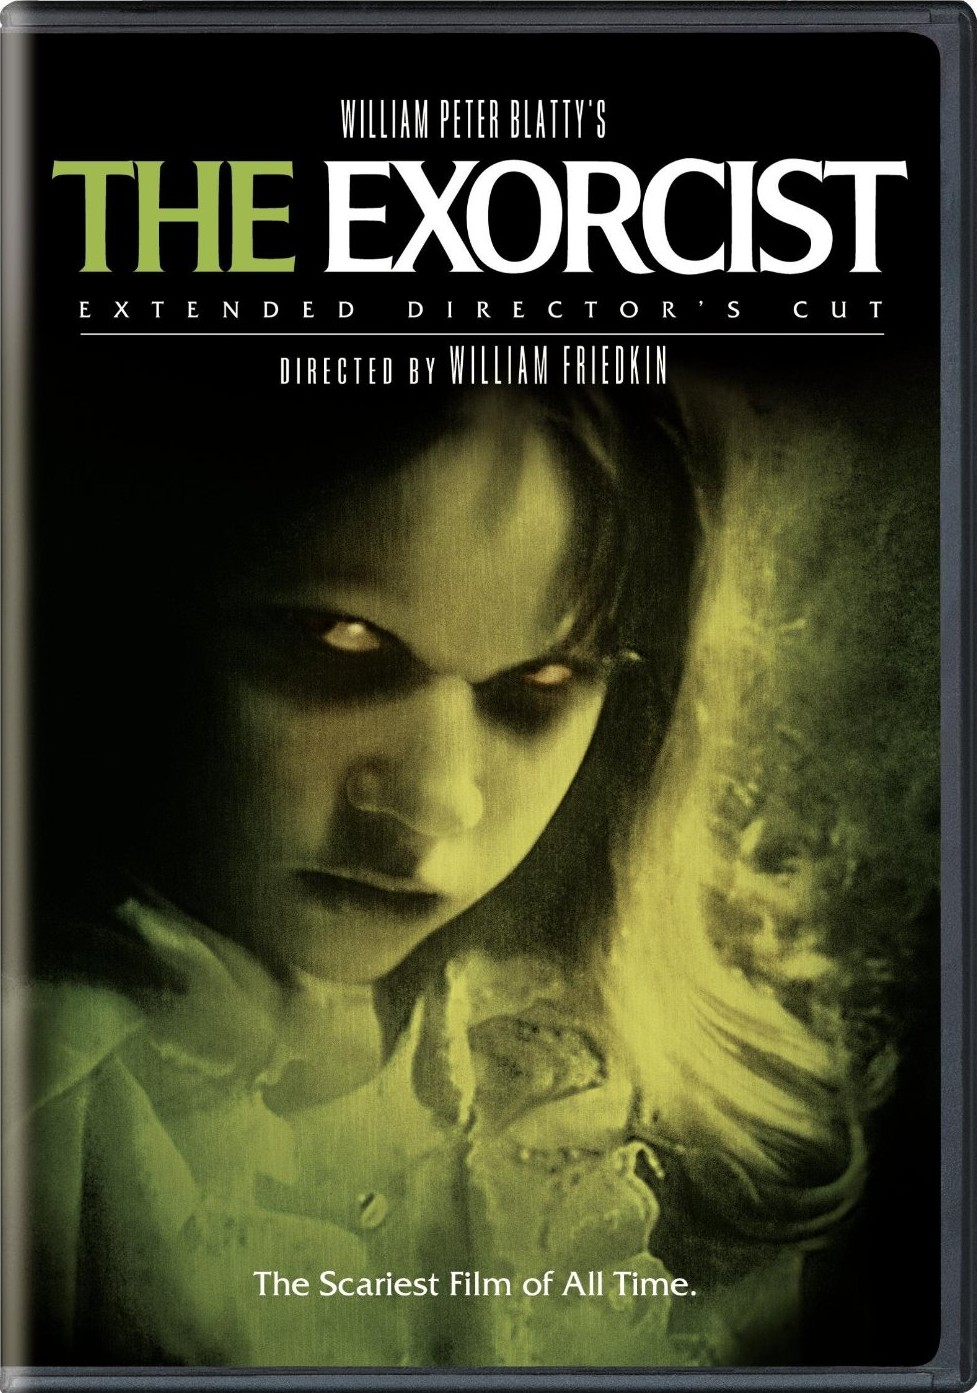 http://3.bp.blogspot.com/_LqCU0Pk6Y_M/TKkBwbEubMI/AAAAAAAACNA/0cg_fkton98/s1600/The+Exorcist.jpg